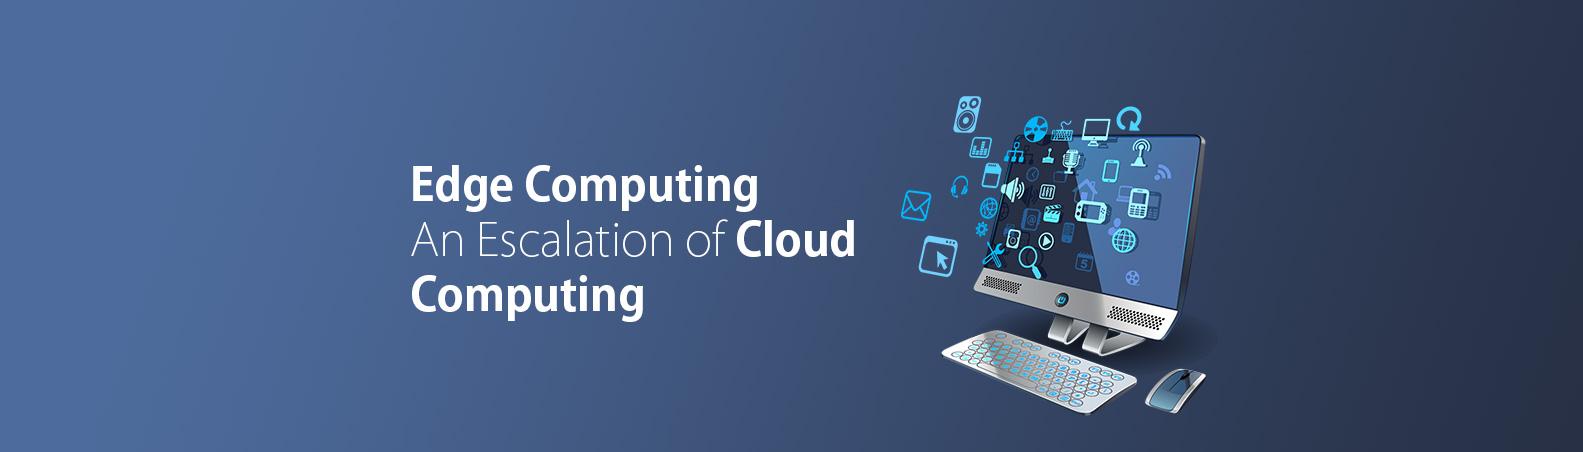 Edge Computing – An Escalation of Cloud Computing